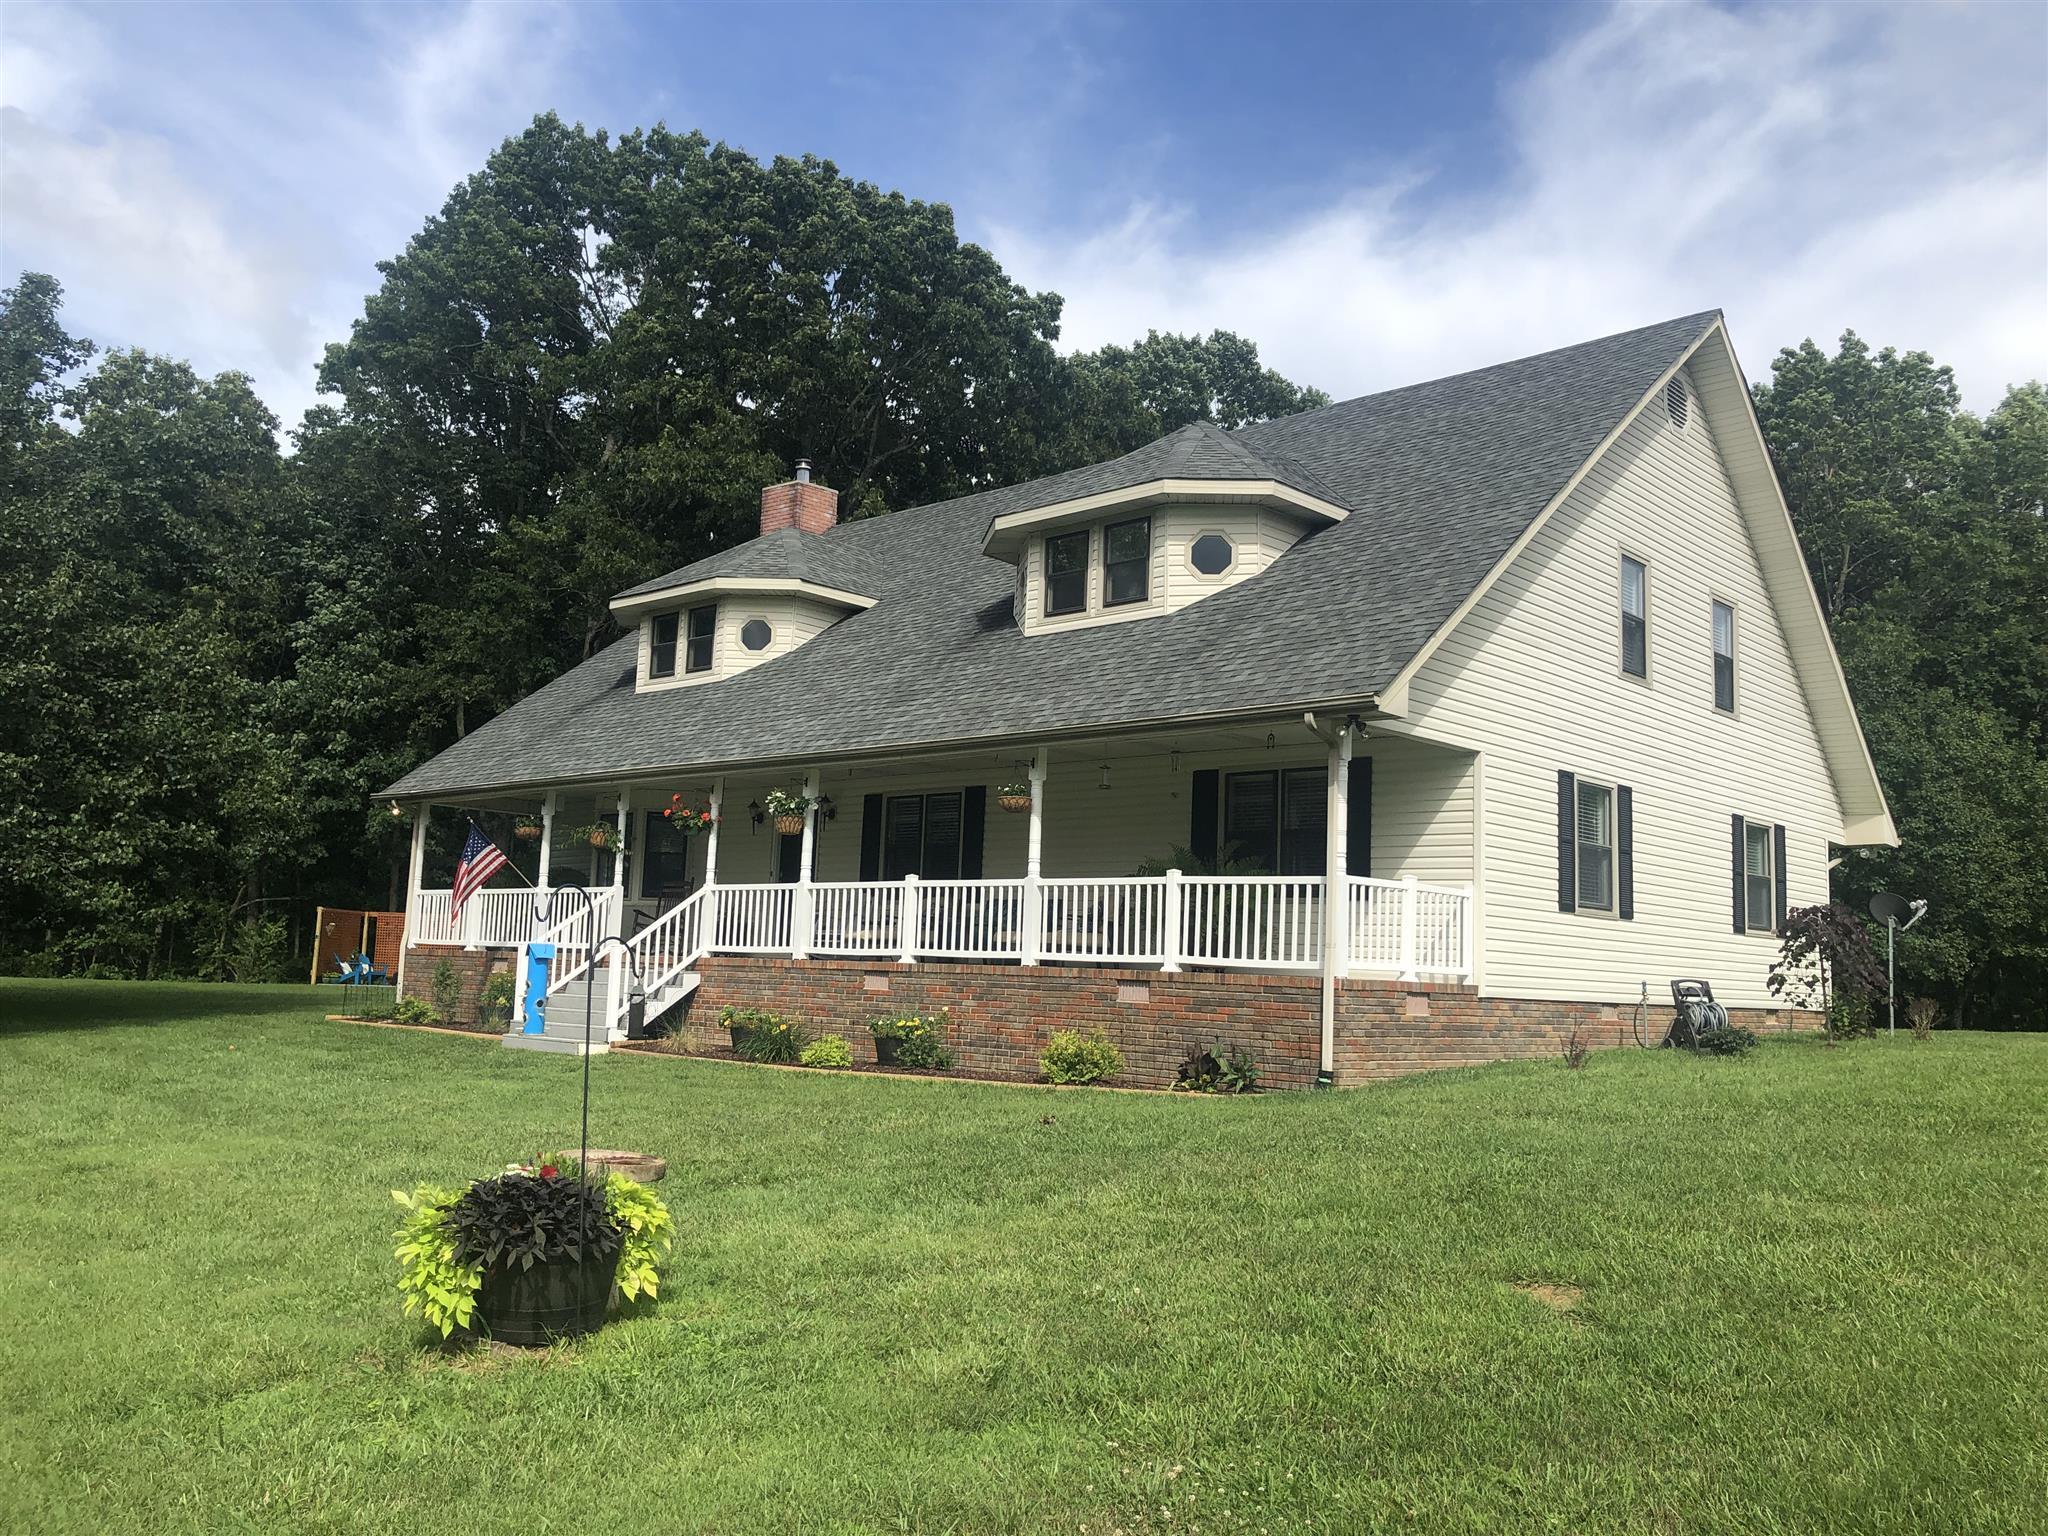 229 Gradys Rd, McMinnville, TN 37110 - McMinnville, TN real estate listing